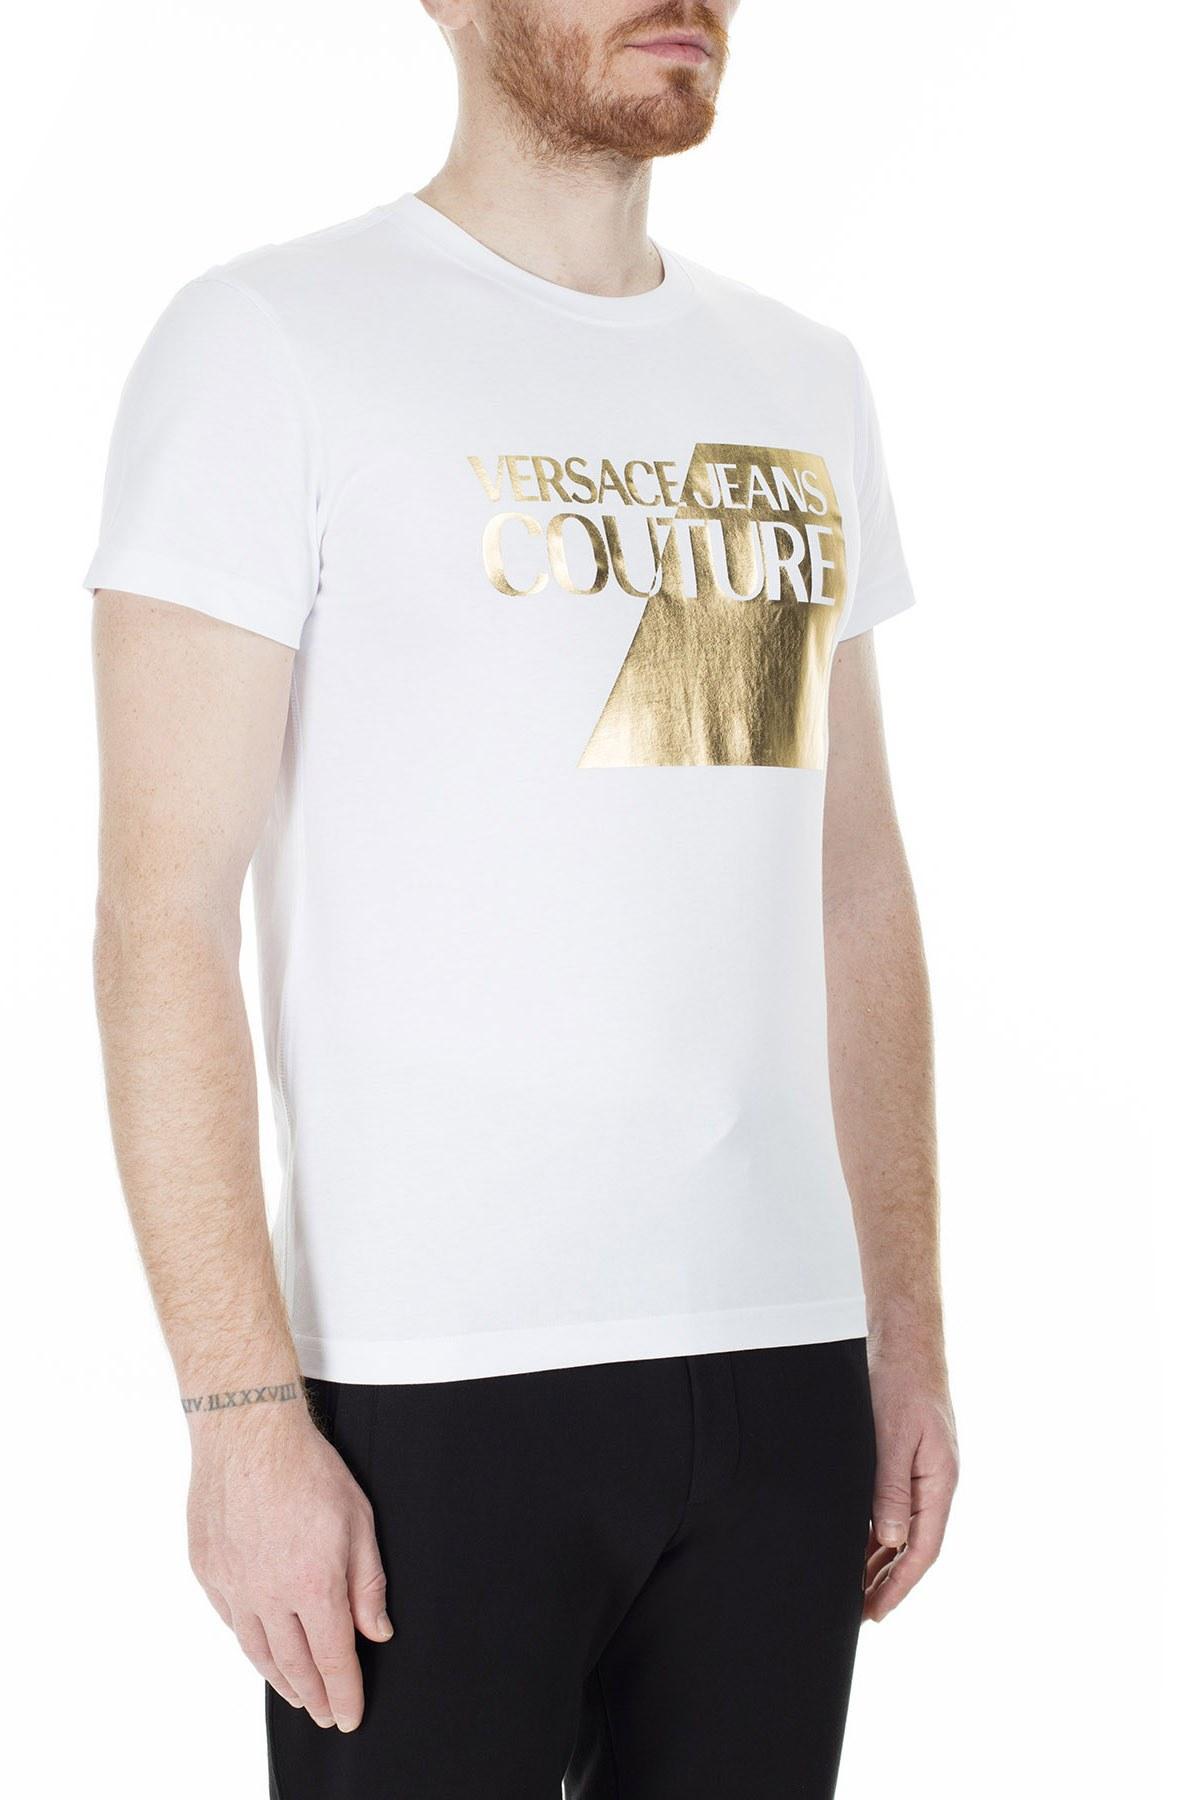 Versace Jeans Couture Slim Fit Erkek T Shirt B3GVB7TP 30319003 BEYAZ